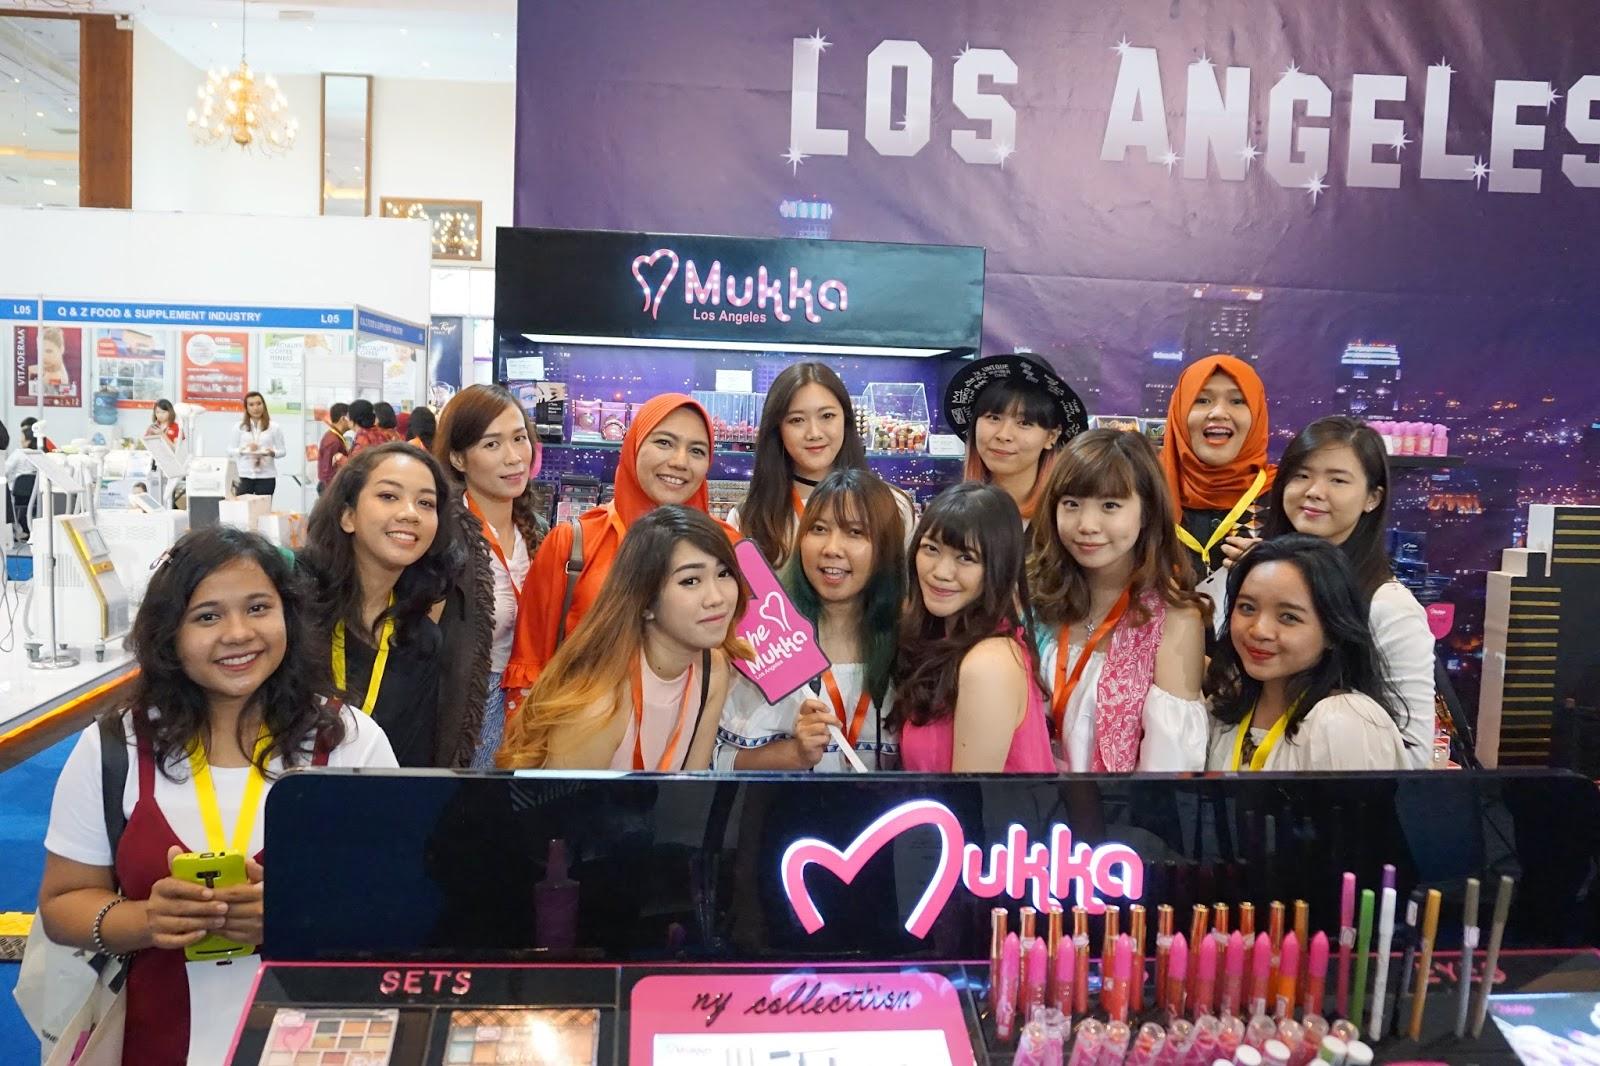 mukka kosmetik blogger gathering | bigdreamerblog.com